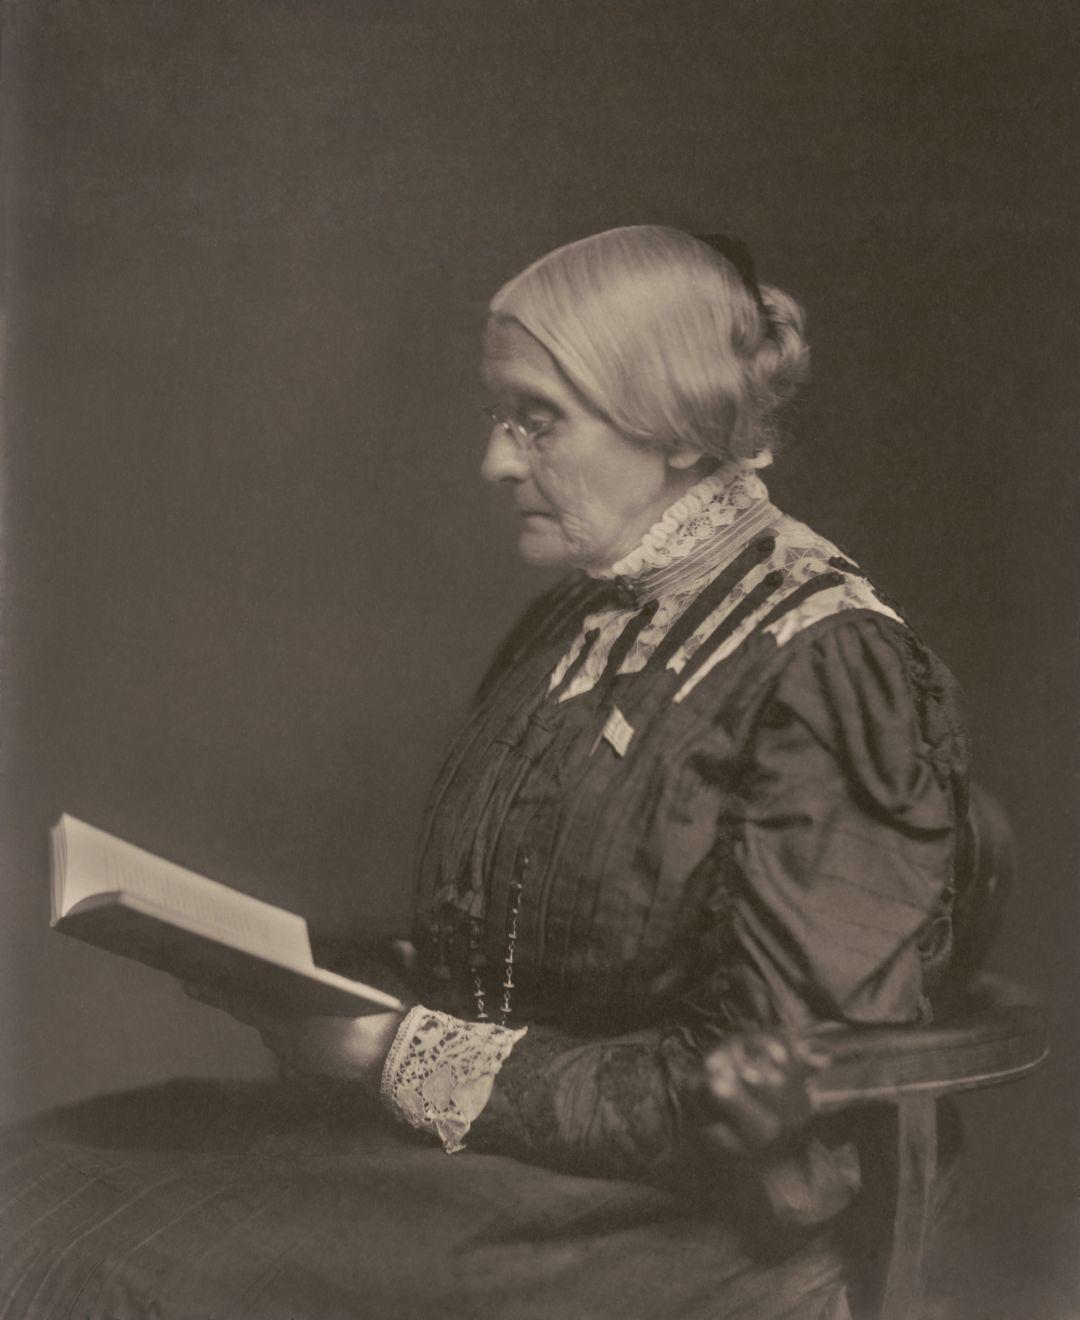 Susan B. Anthony reading a book circa 1900.